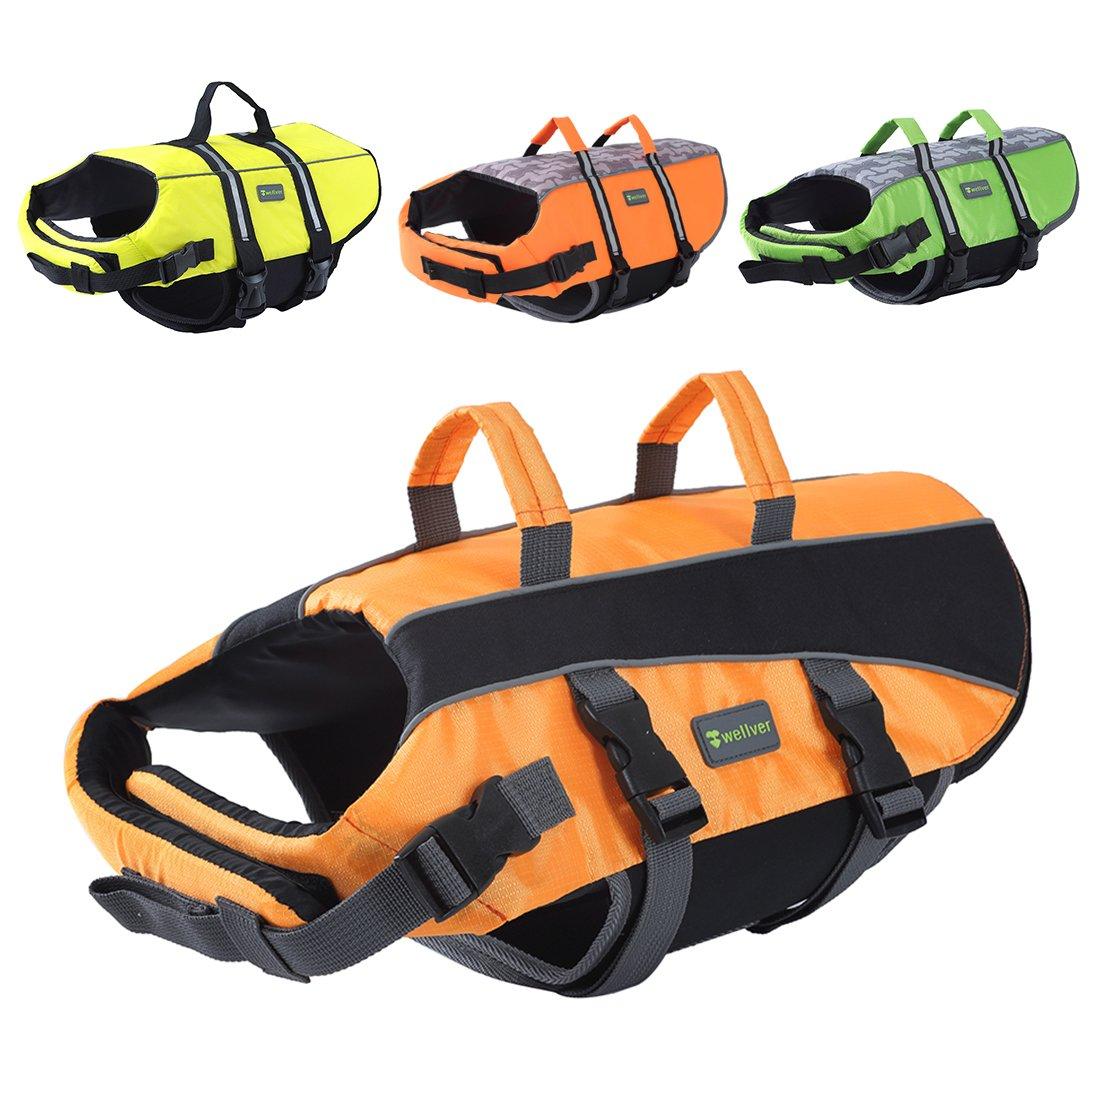 orange 2 XL orange 2 XL Wellver Dog Life Jacket, Pet Life Saver Swimsuit Preserver Training Vest for Swimming(NO Reflective Strip),Bright orange,XLarge